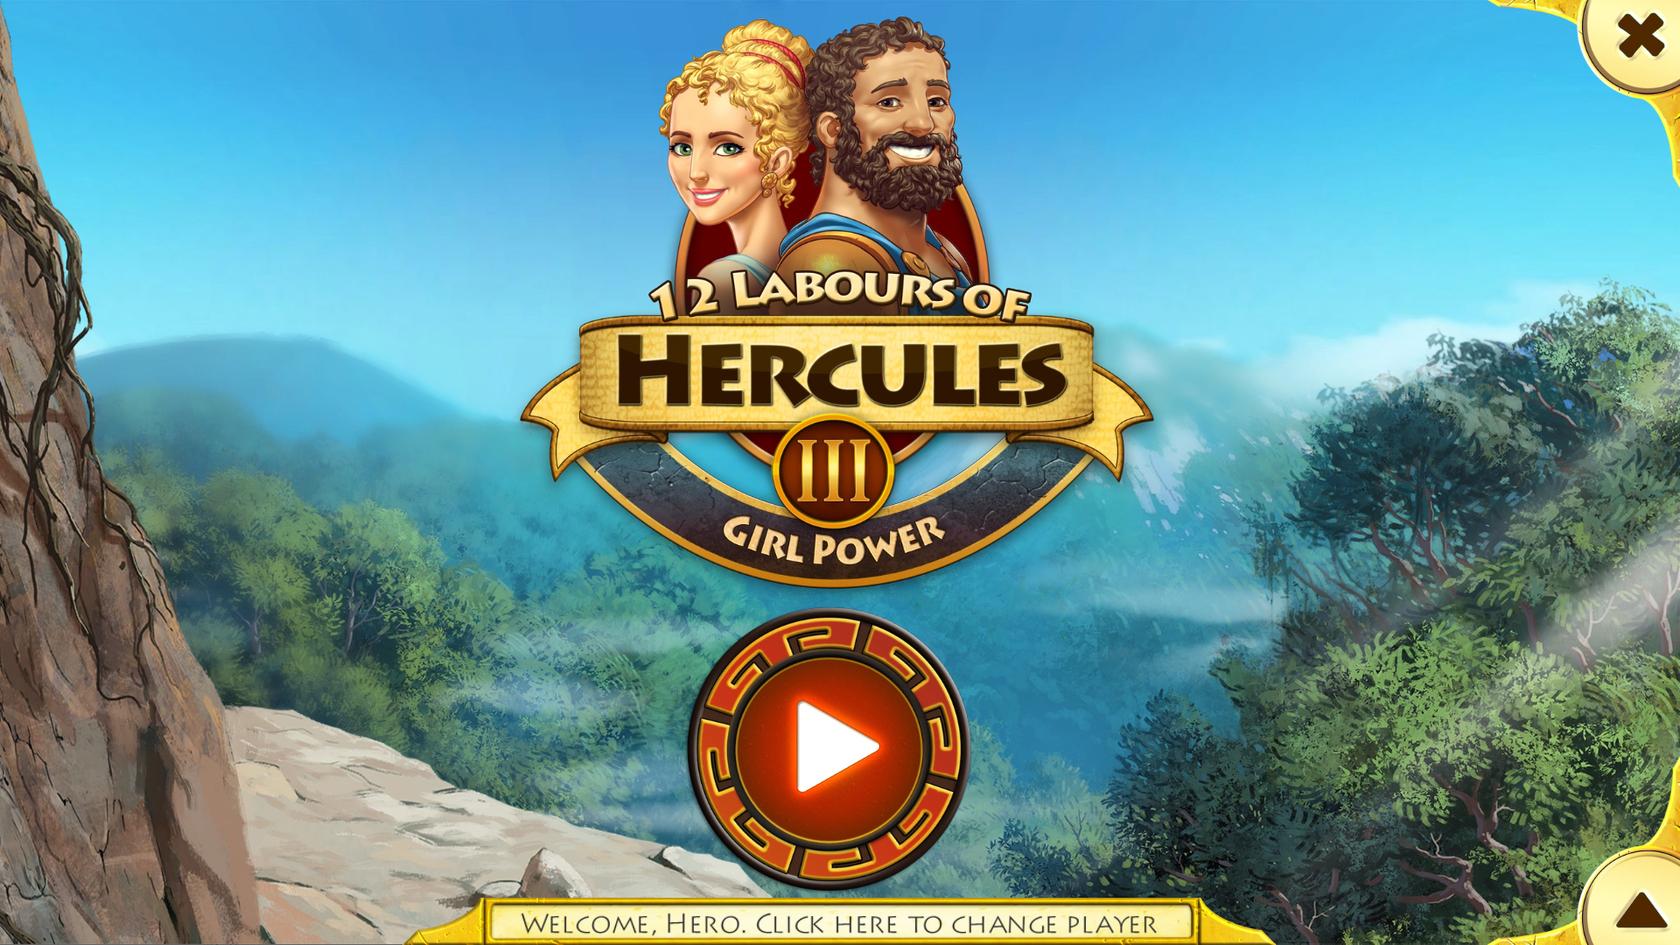 12 Labours Of Hercules Iii Girl Power